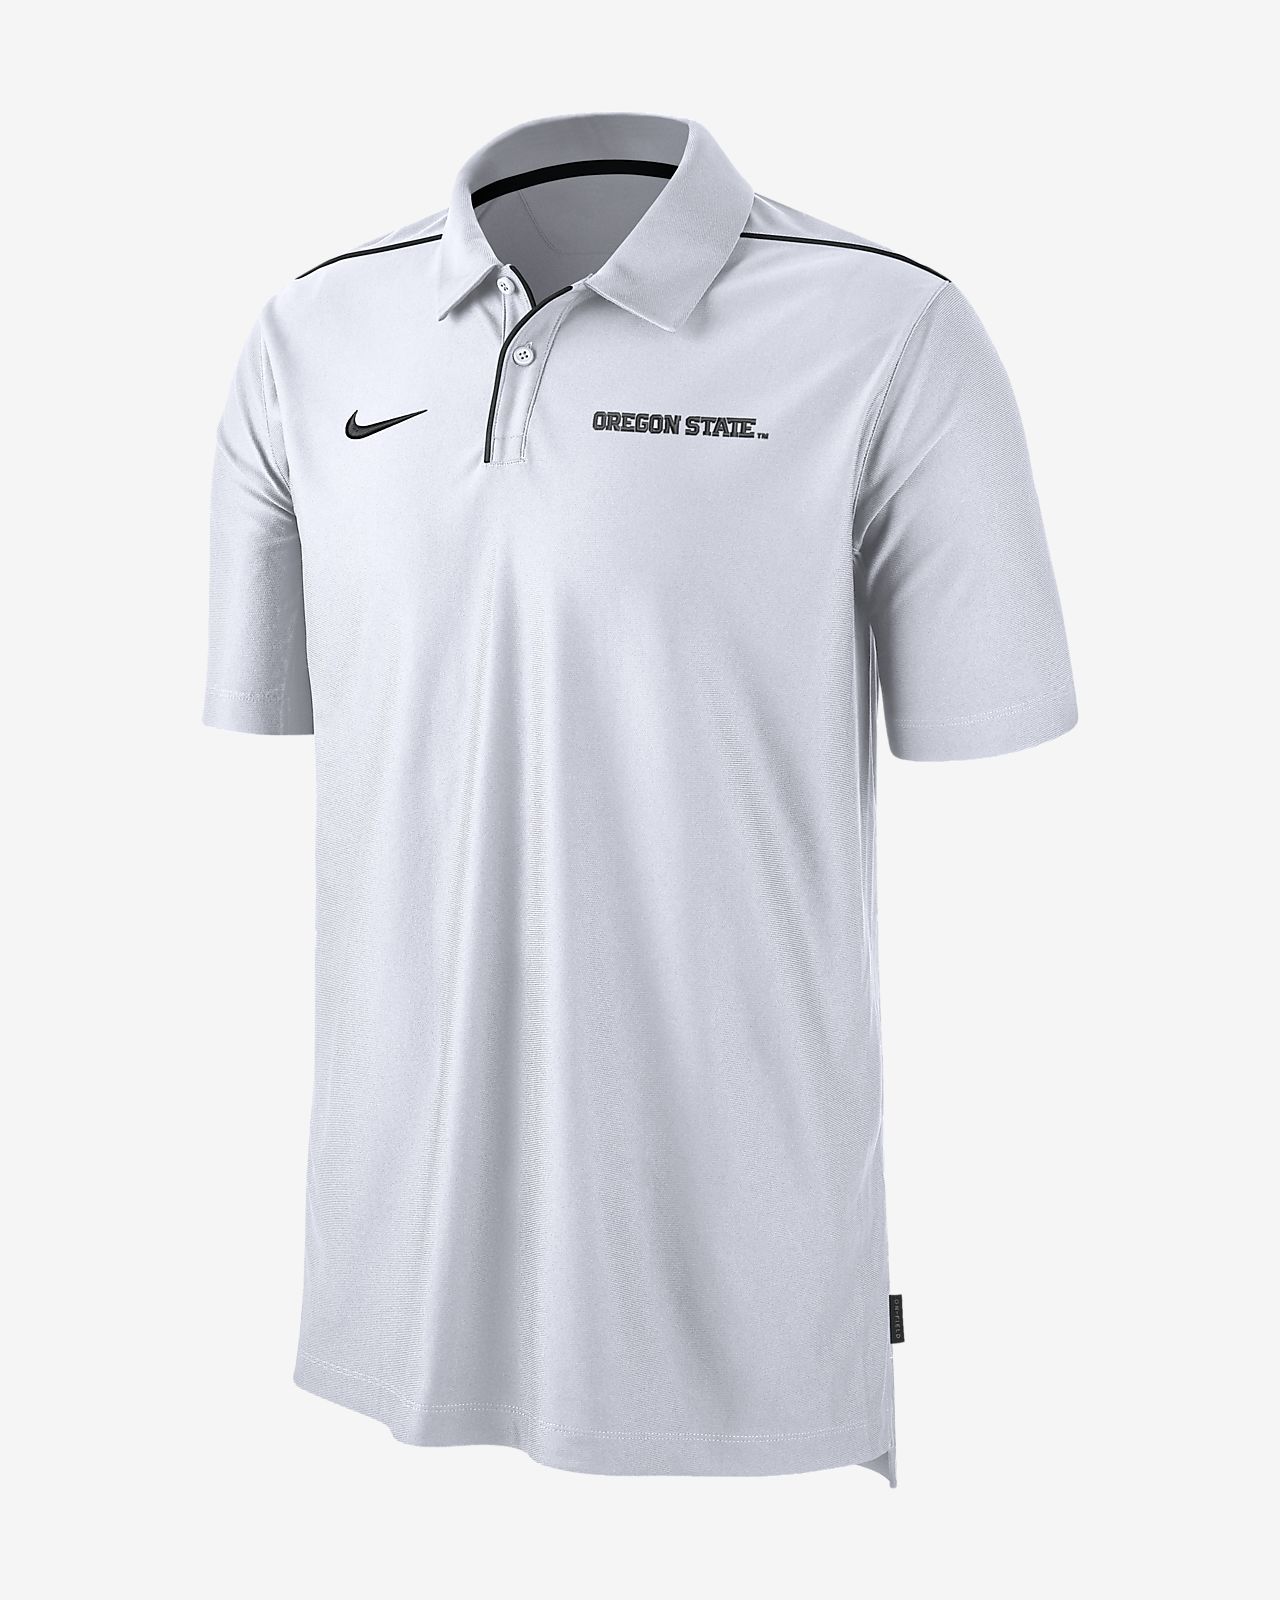 Nike College Dri-FIT Team Issue (Oregon State) Men's Polo